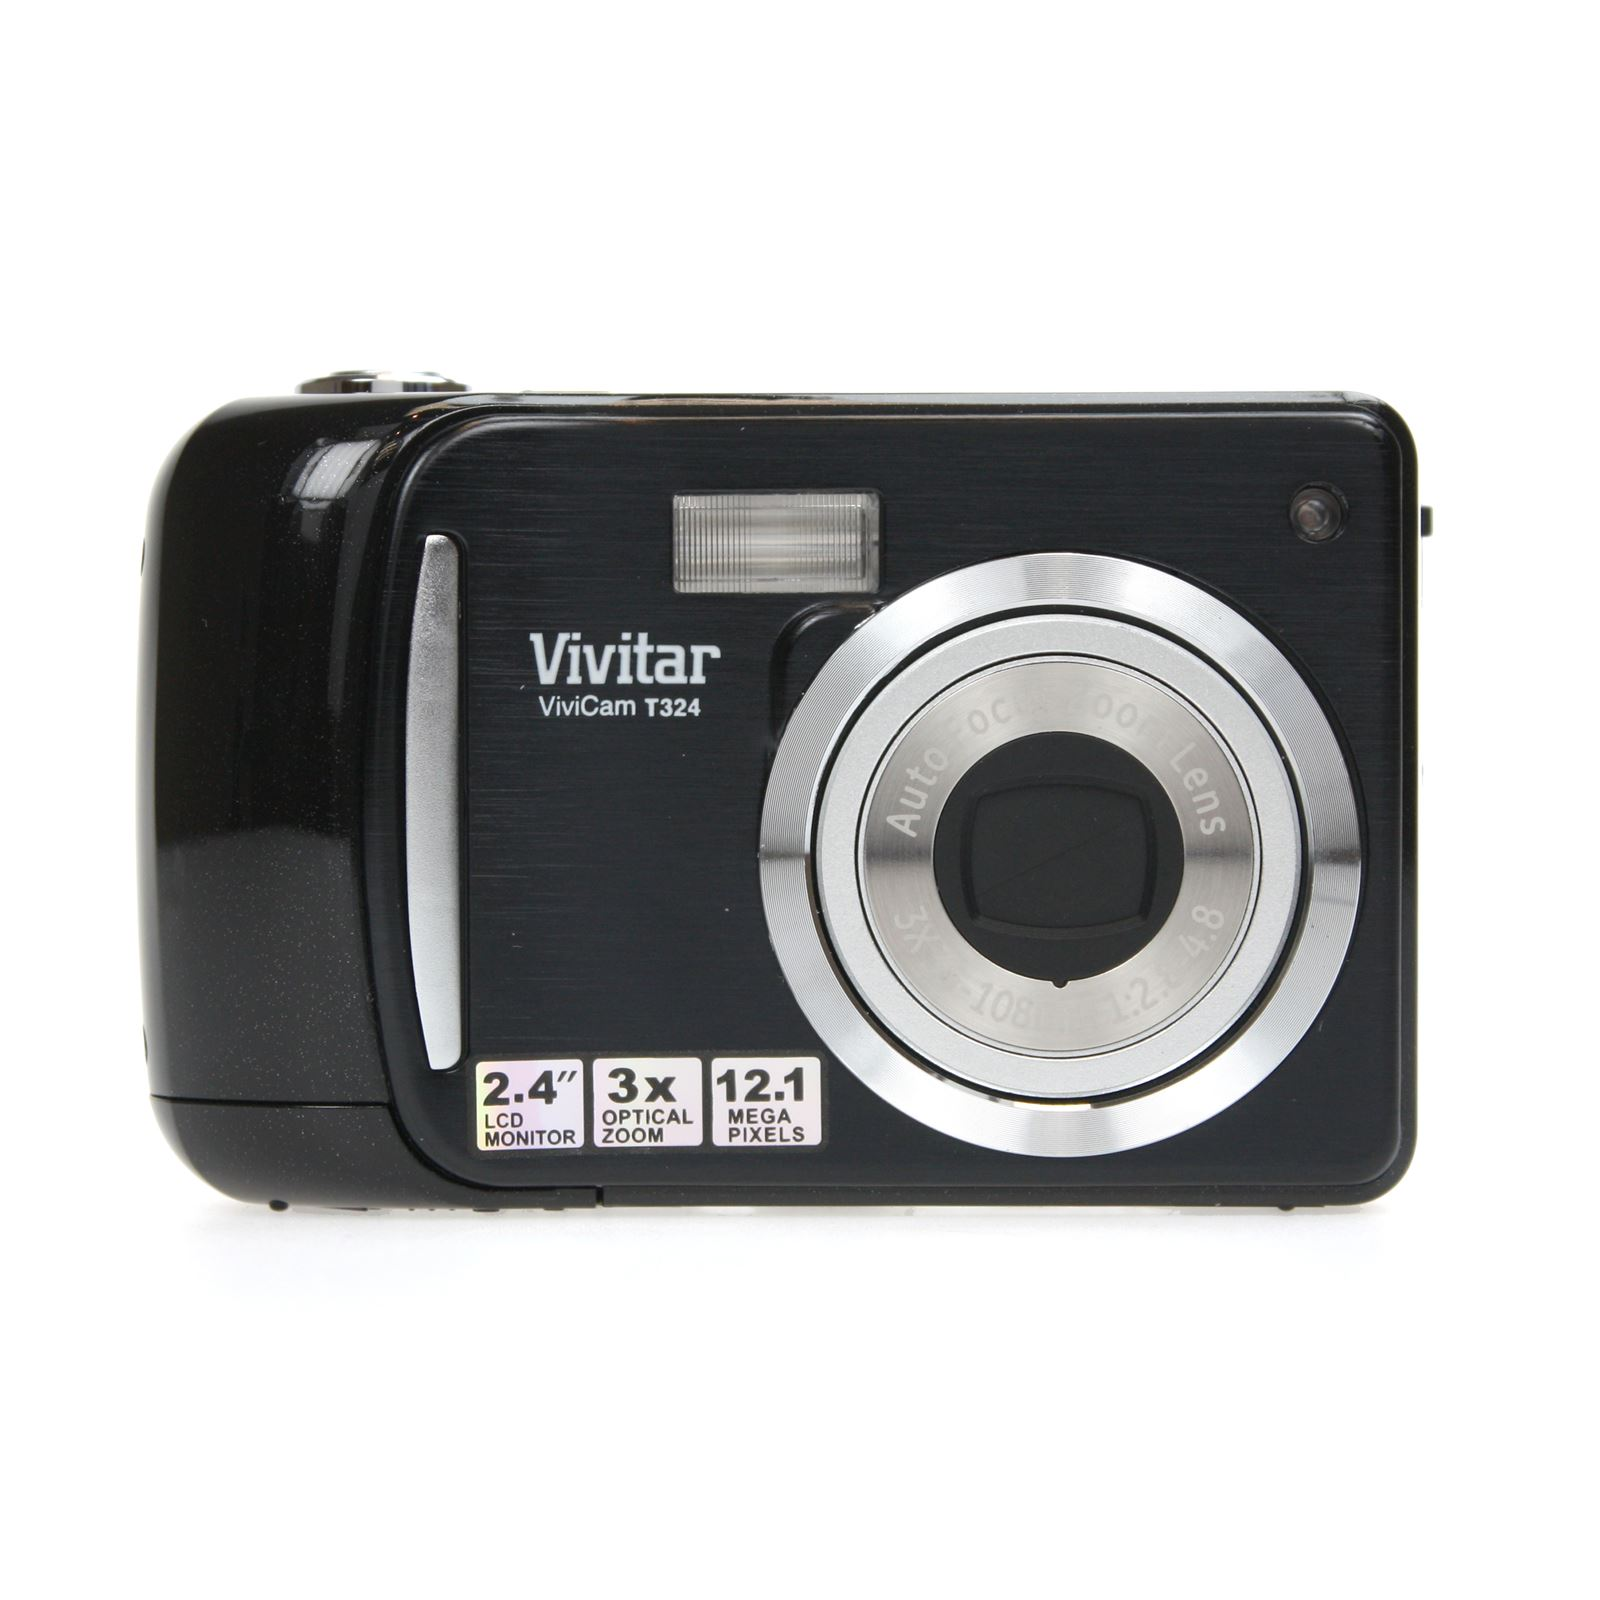 vivitar vivicam t324 compact camera 12 mp 3x optical zoom